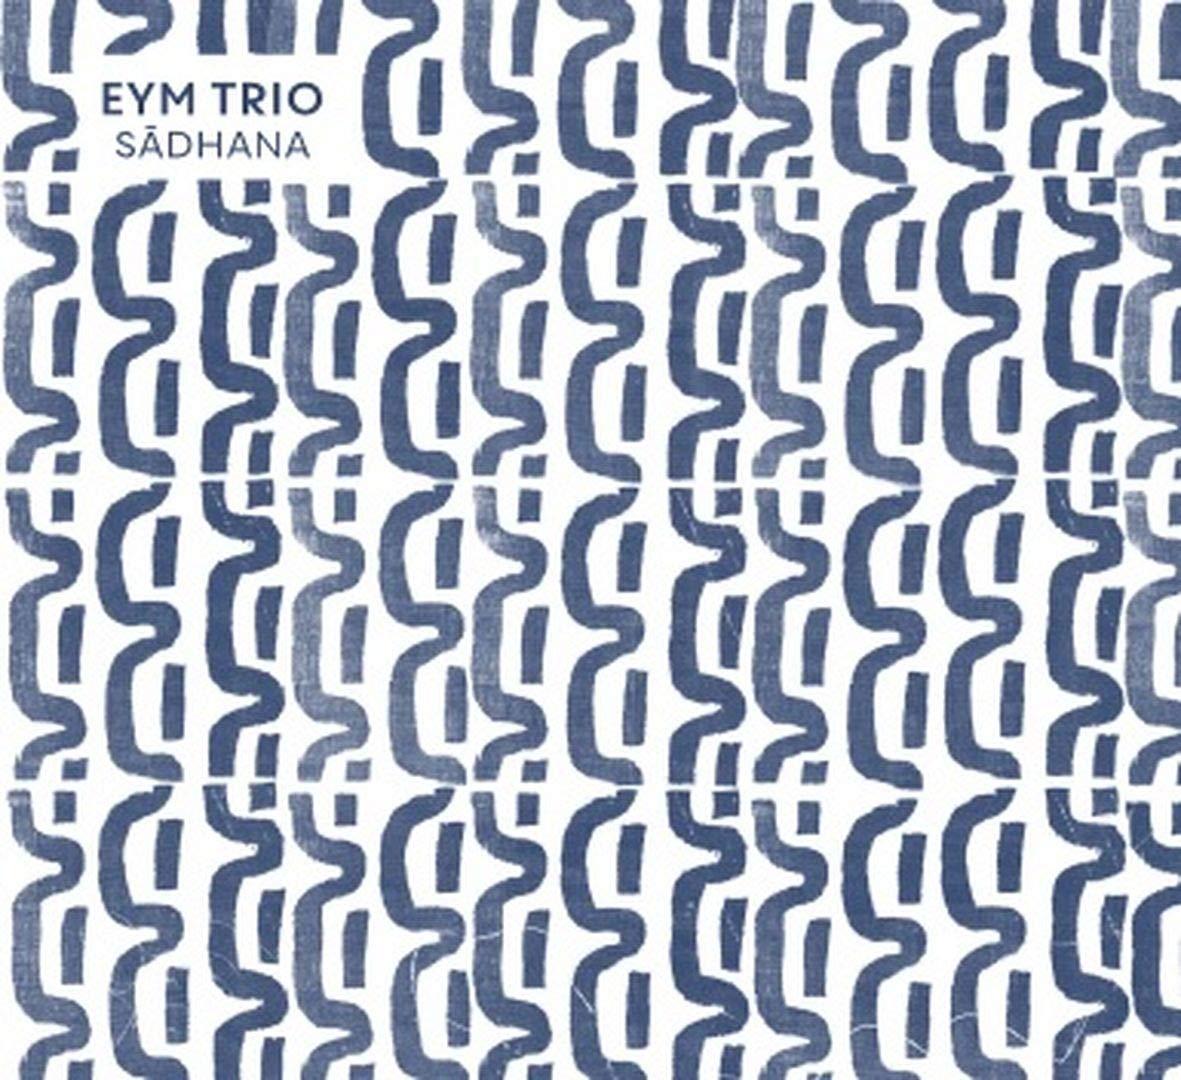 EYM TRIO - Sadhana cover